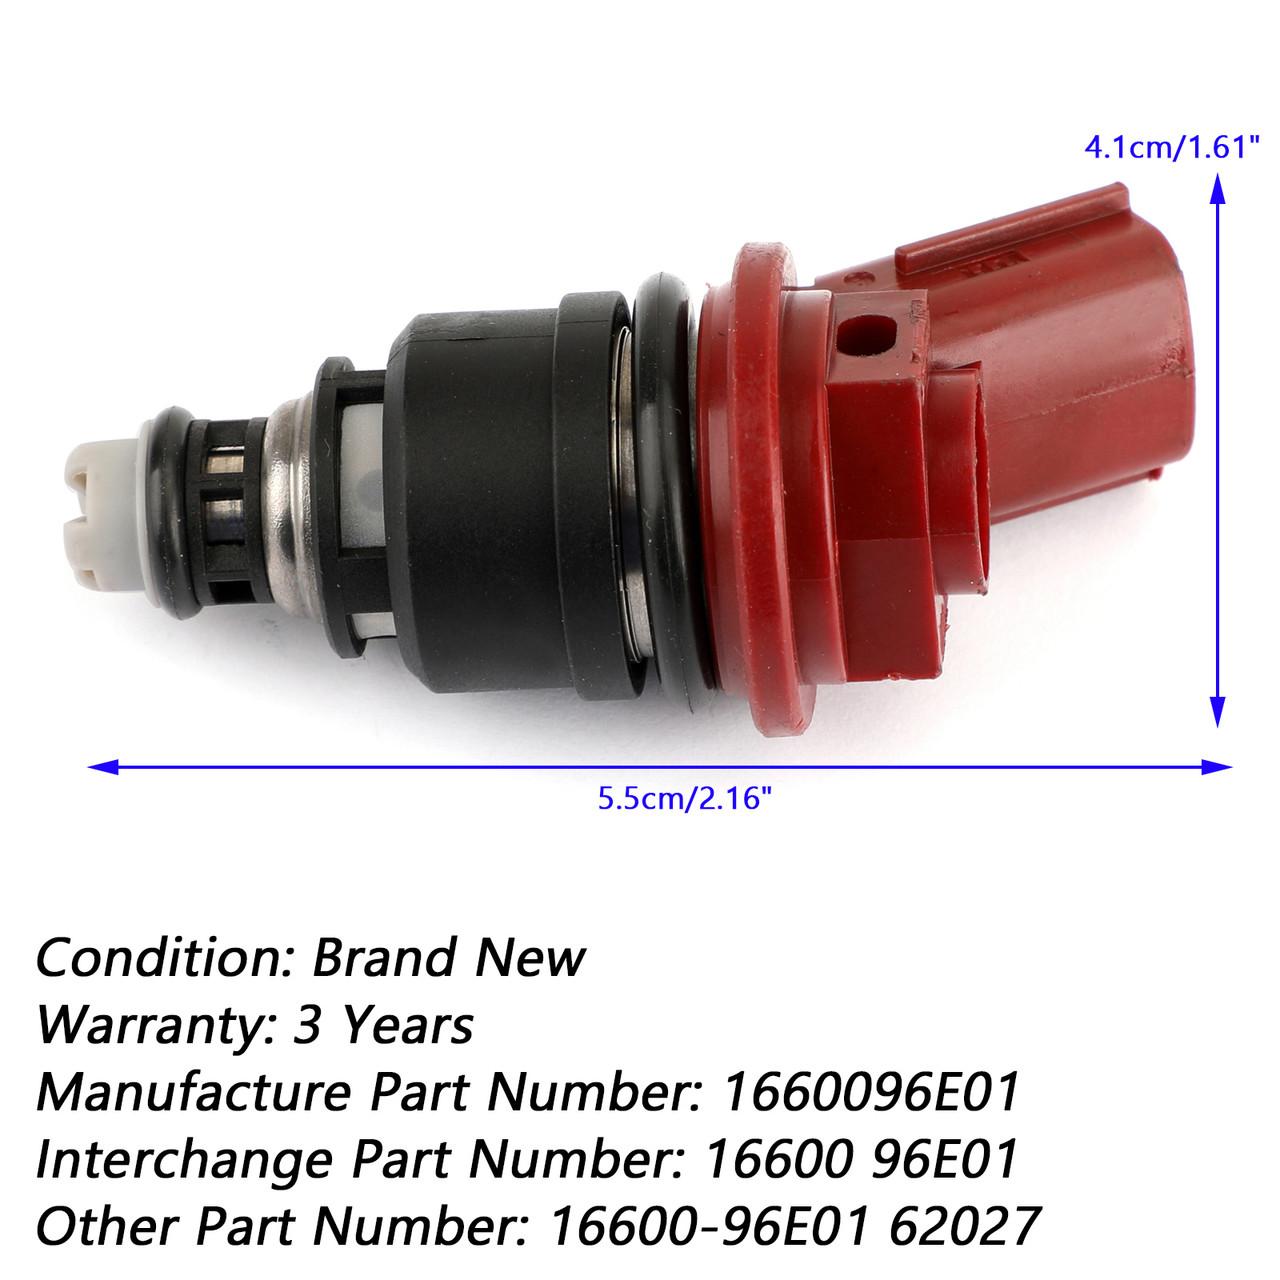 6PCS Fuel Injector Fit For Infiniti I30 96-99 Nissan Maxima 92-99 1660096E01 Brown